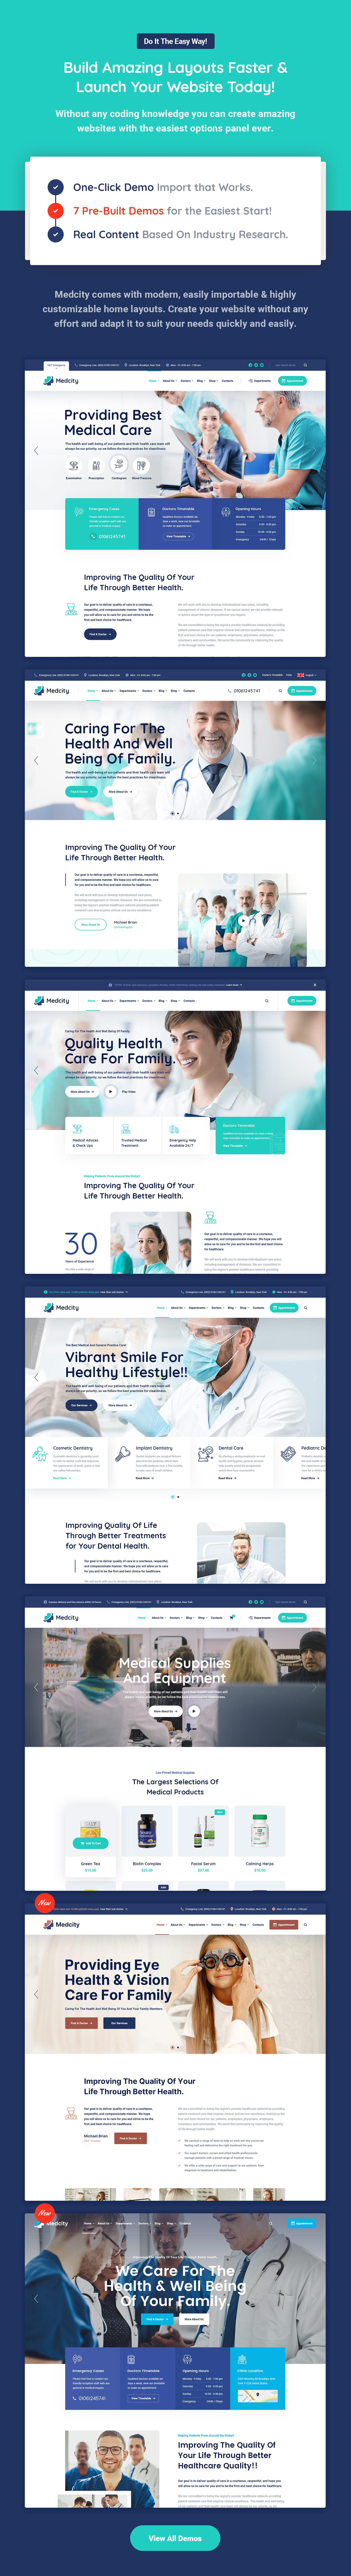 Medcity - Health & Medical WordPress Theme - 6